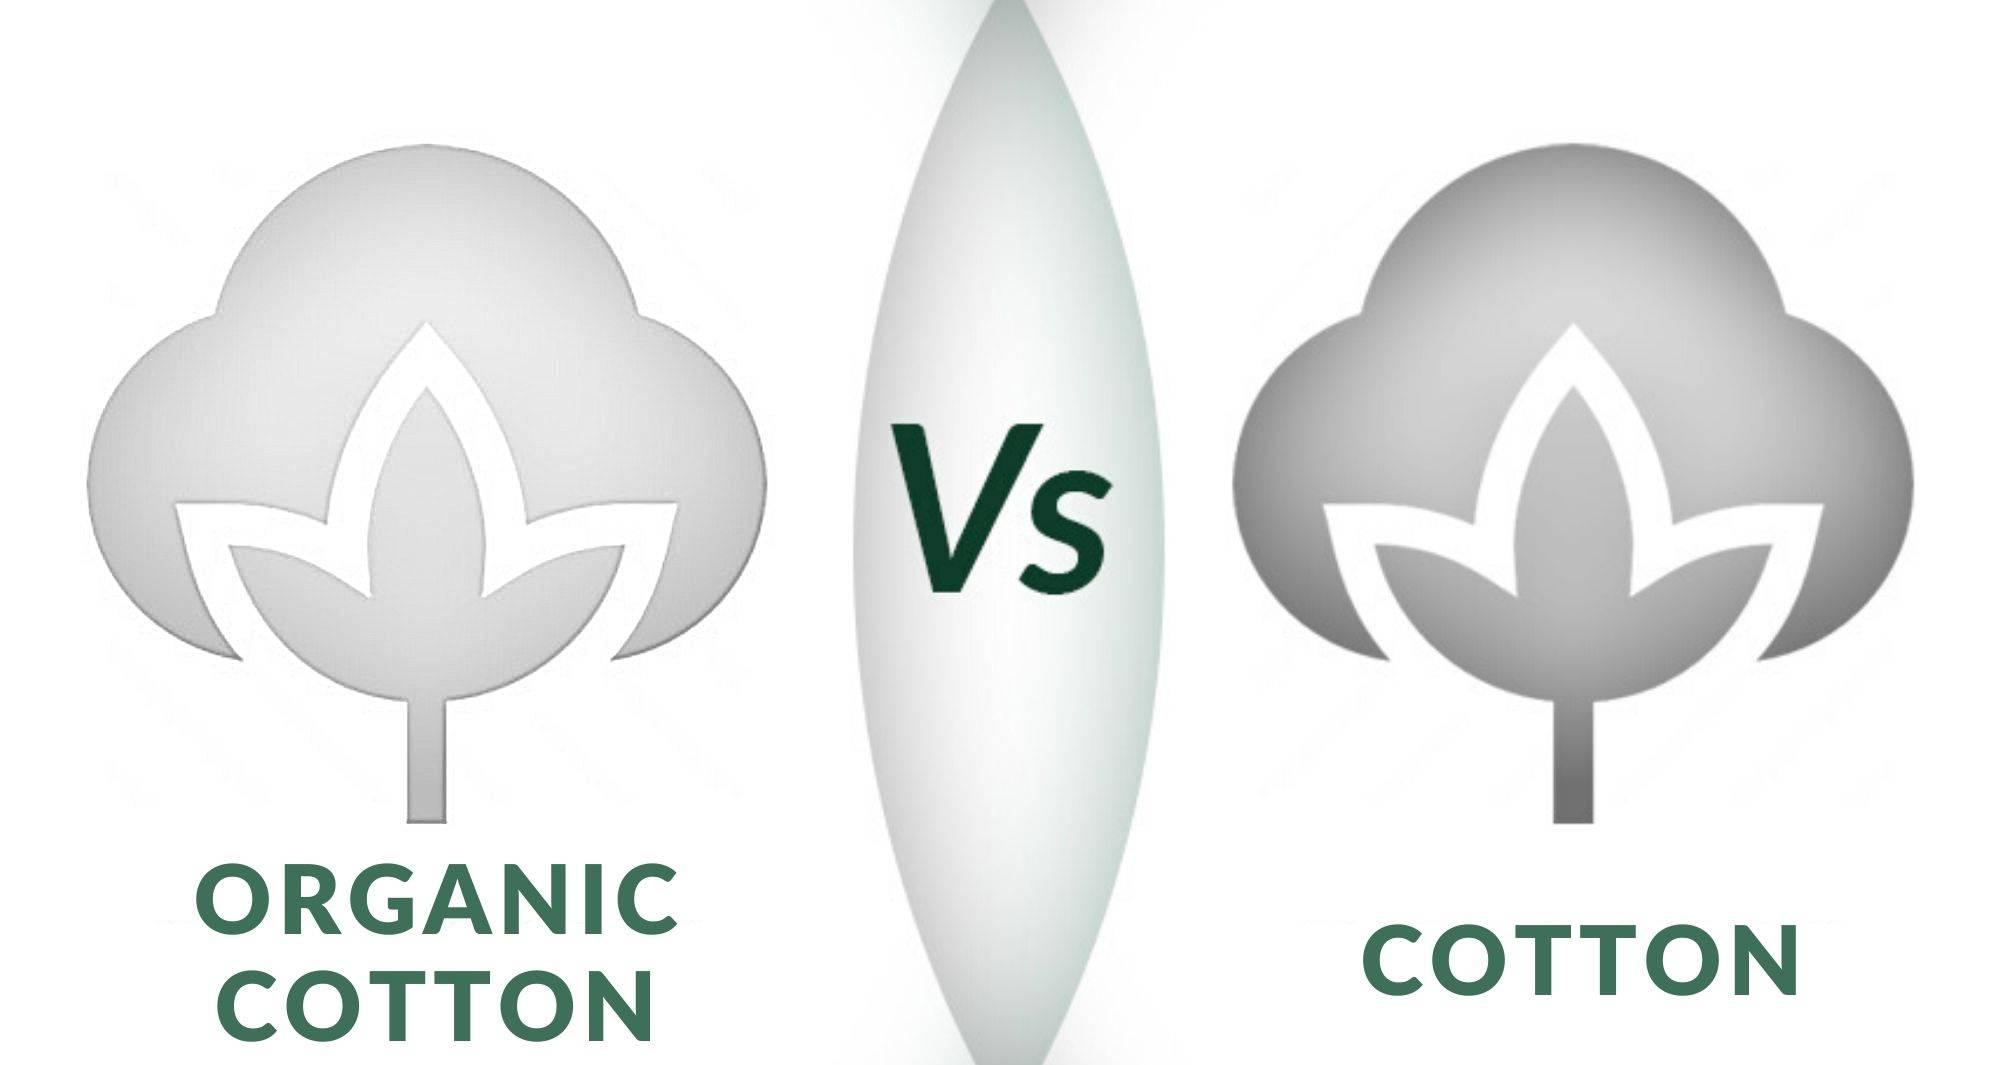 WAMA Underwear Infographic for Organic Cotton Vs Cotton